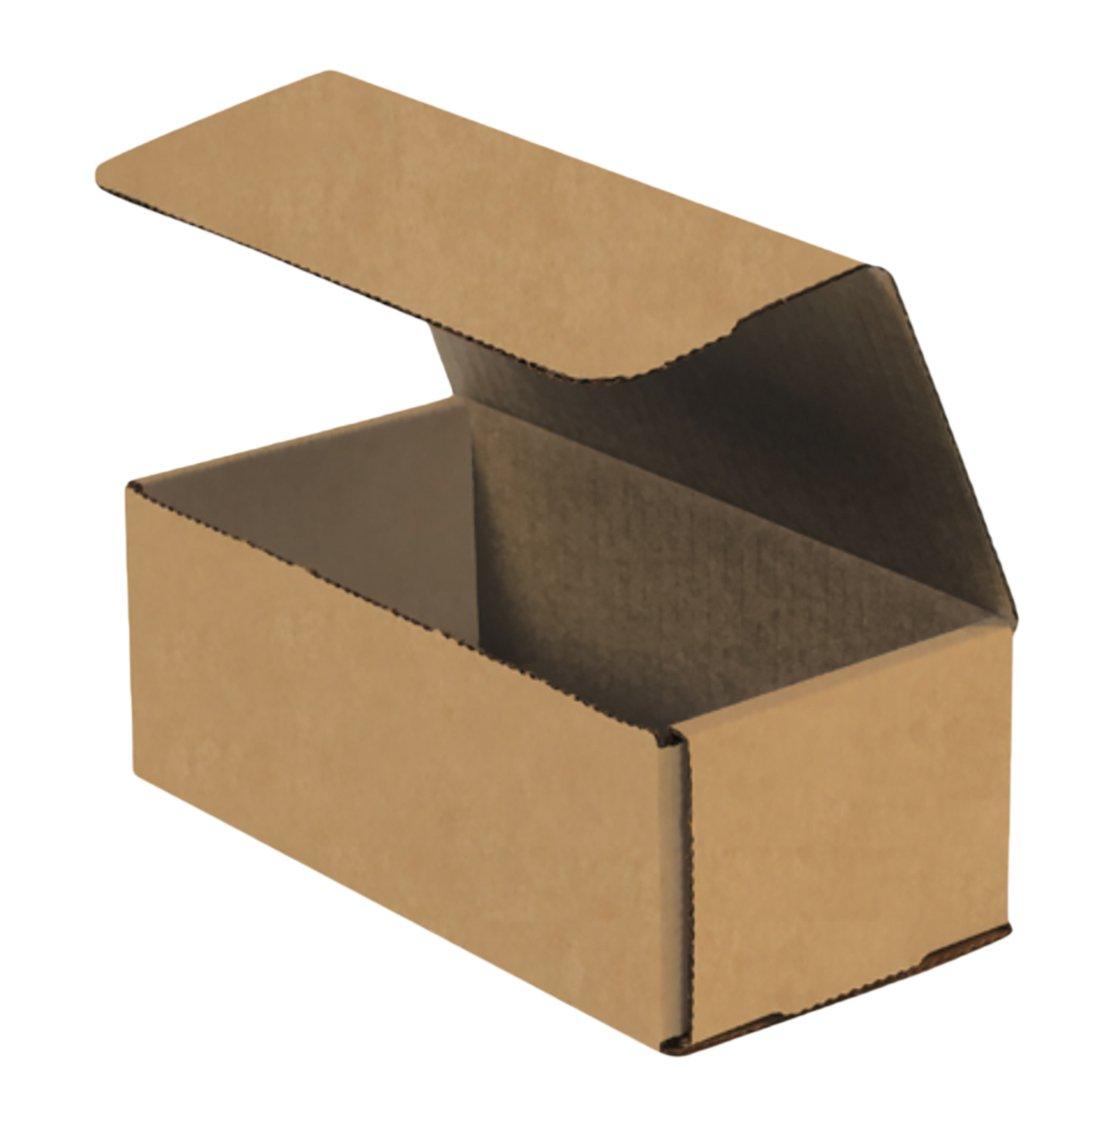 7 1//8 x 5 x 3 RetailSource B070503KM50 Kraft Corrugated Mailers Pack of 50